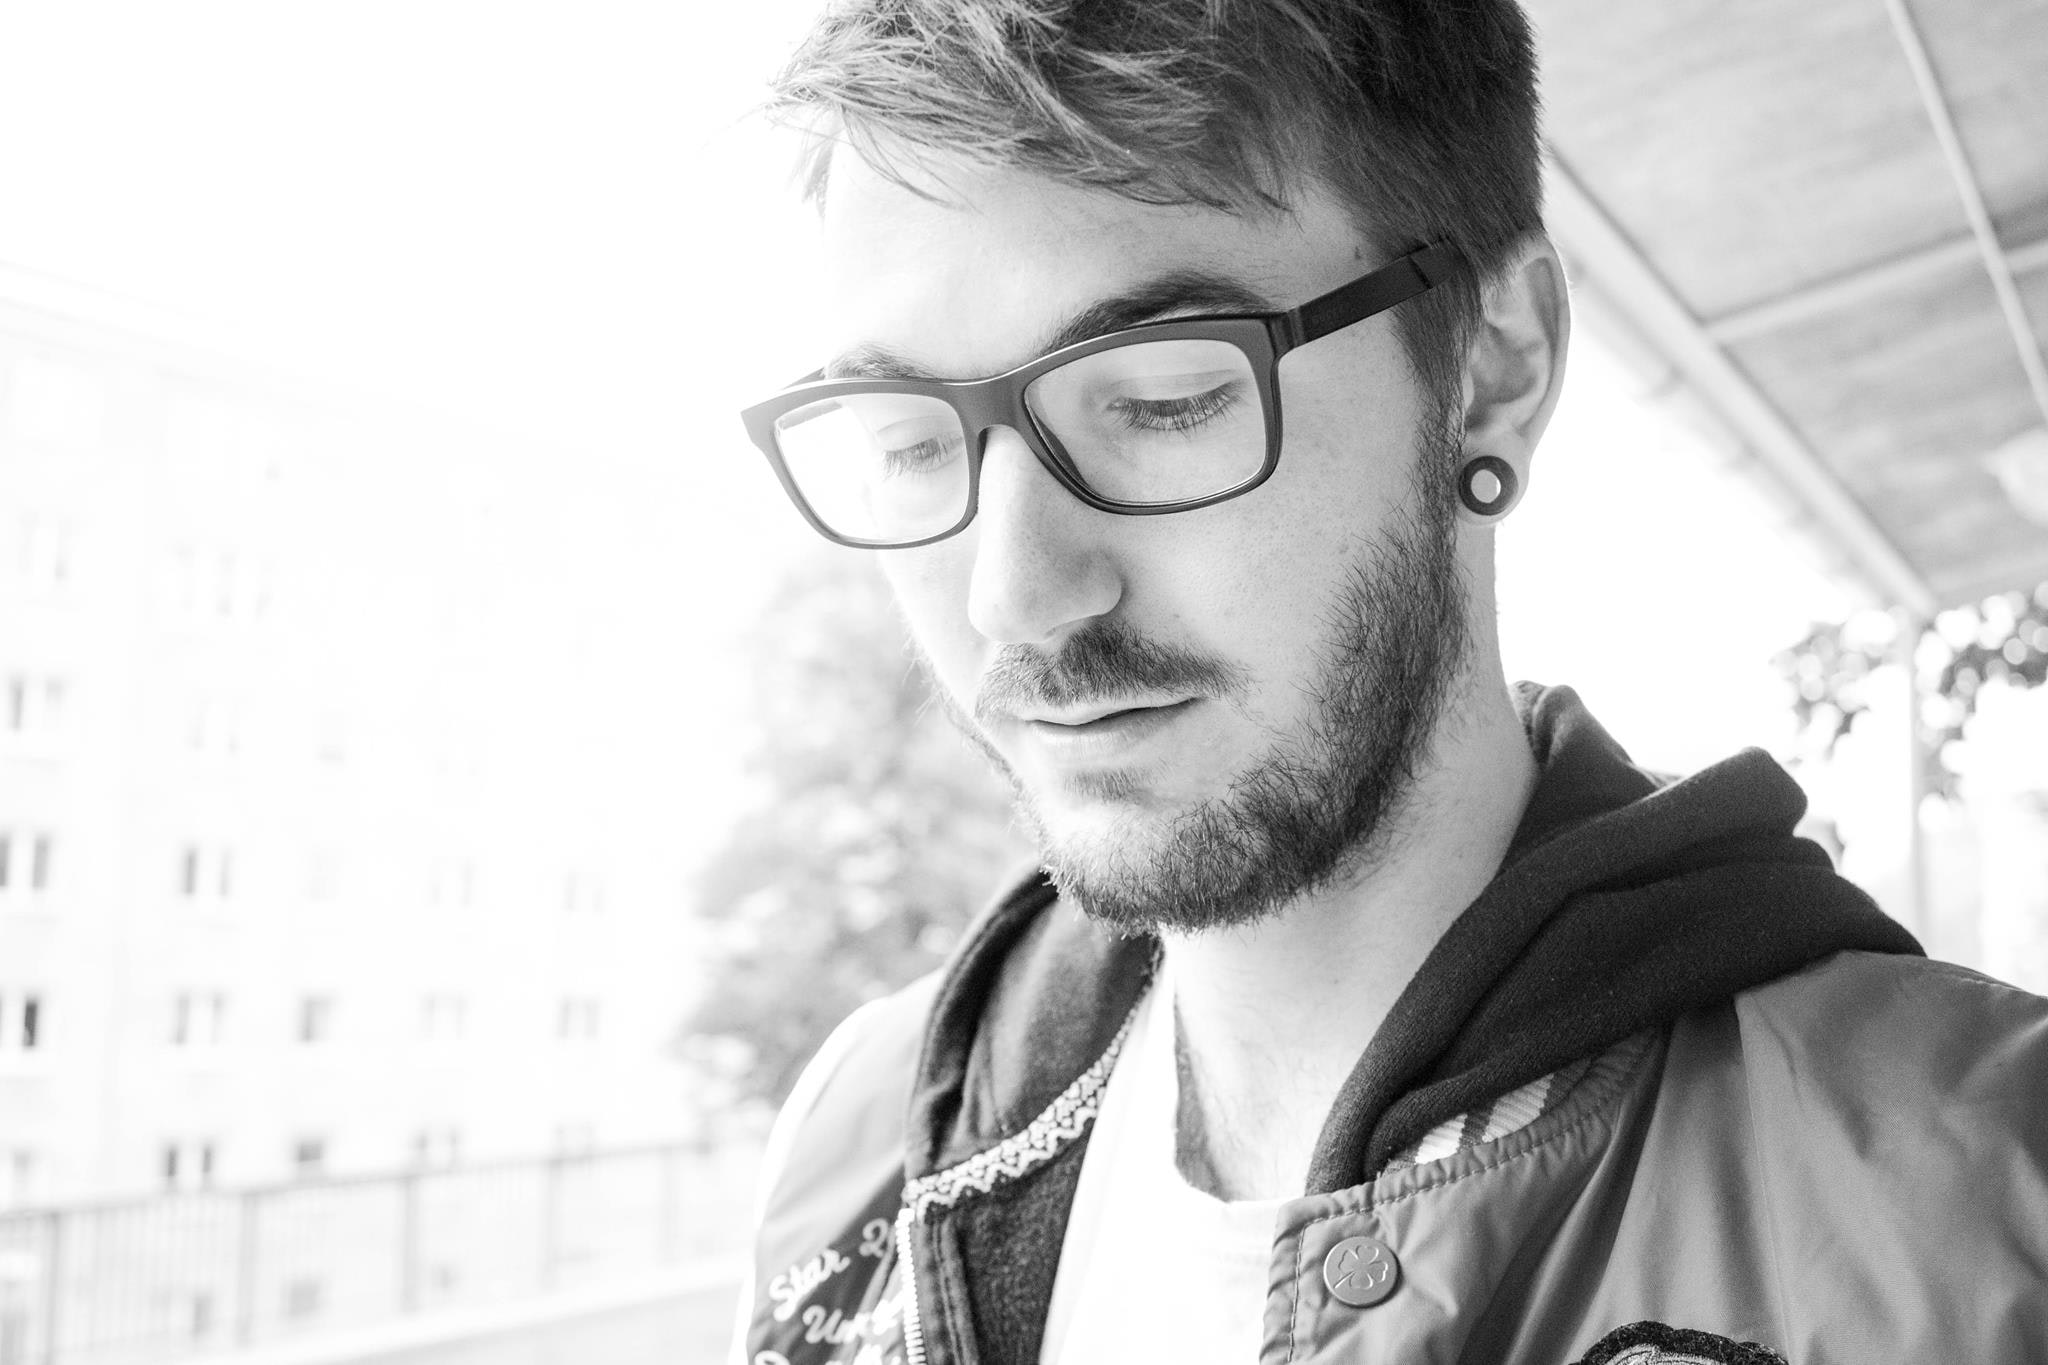 Go to Jonas Lorich's profile